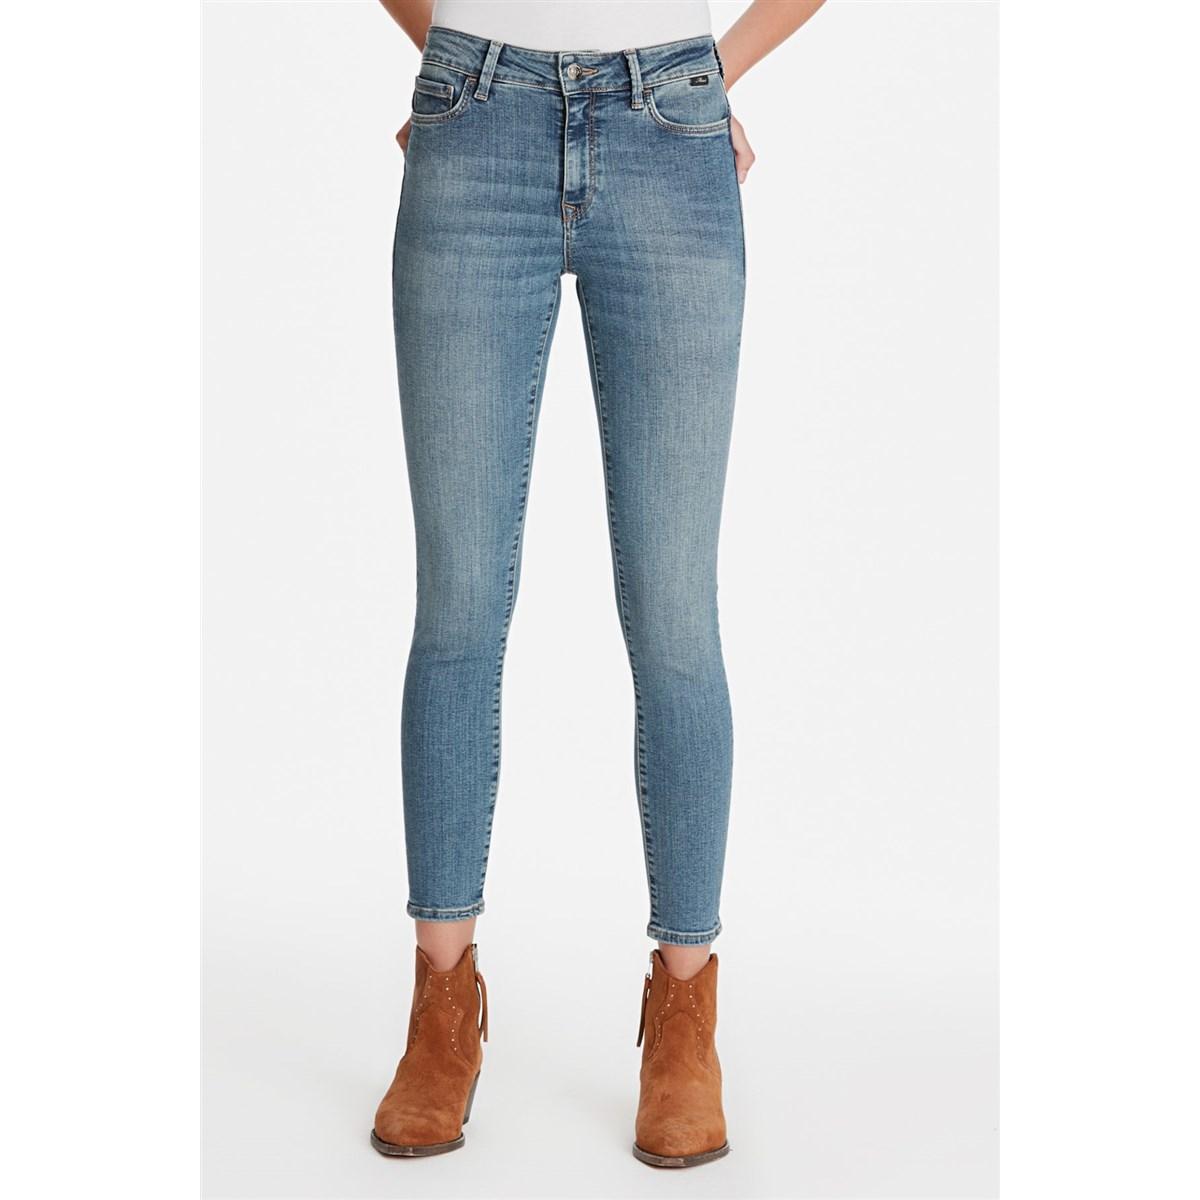 Alissa Kadın Skinny Jean Pantolon